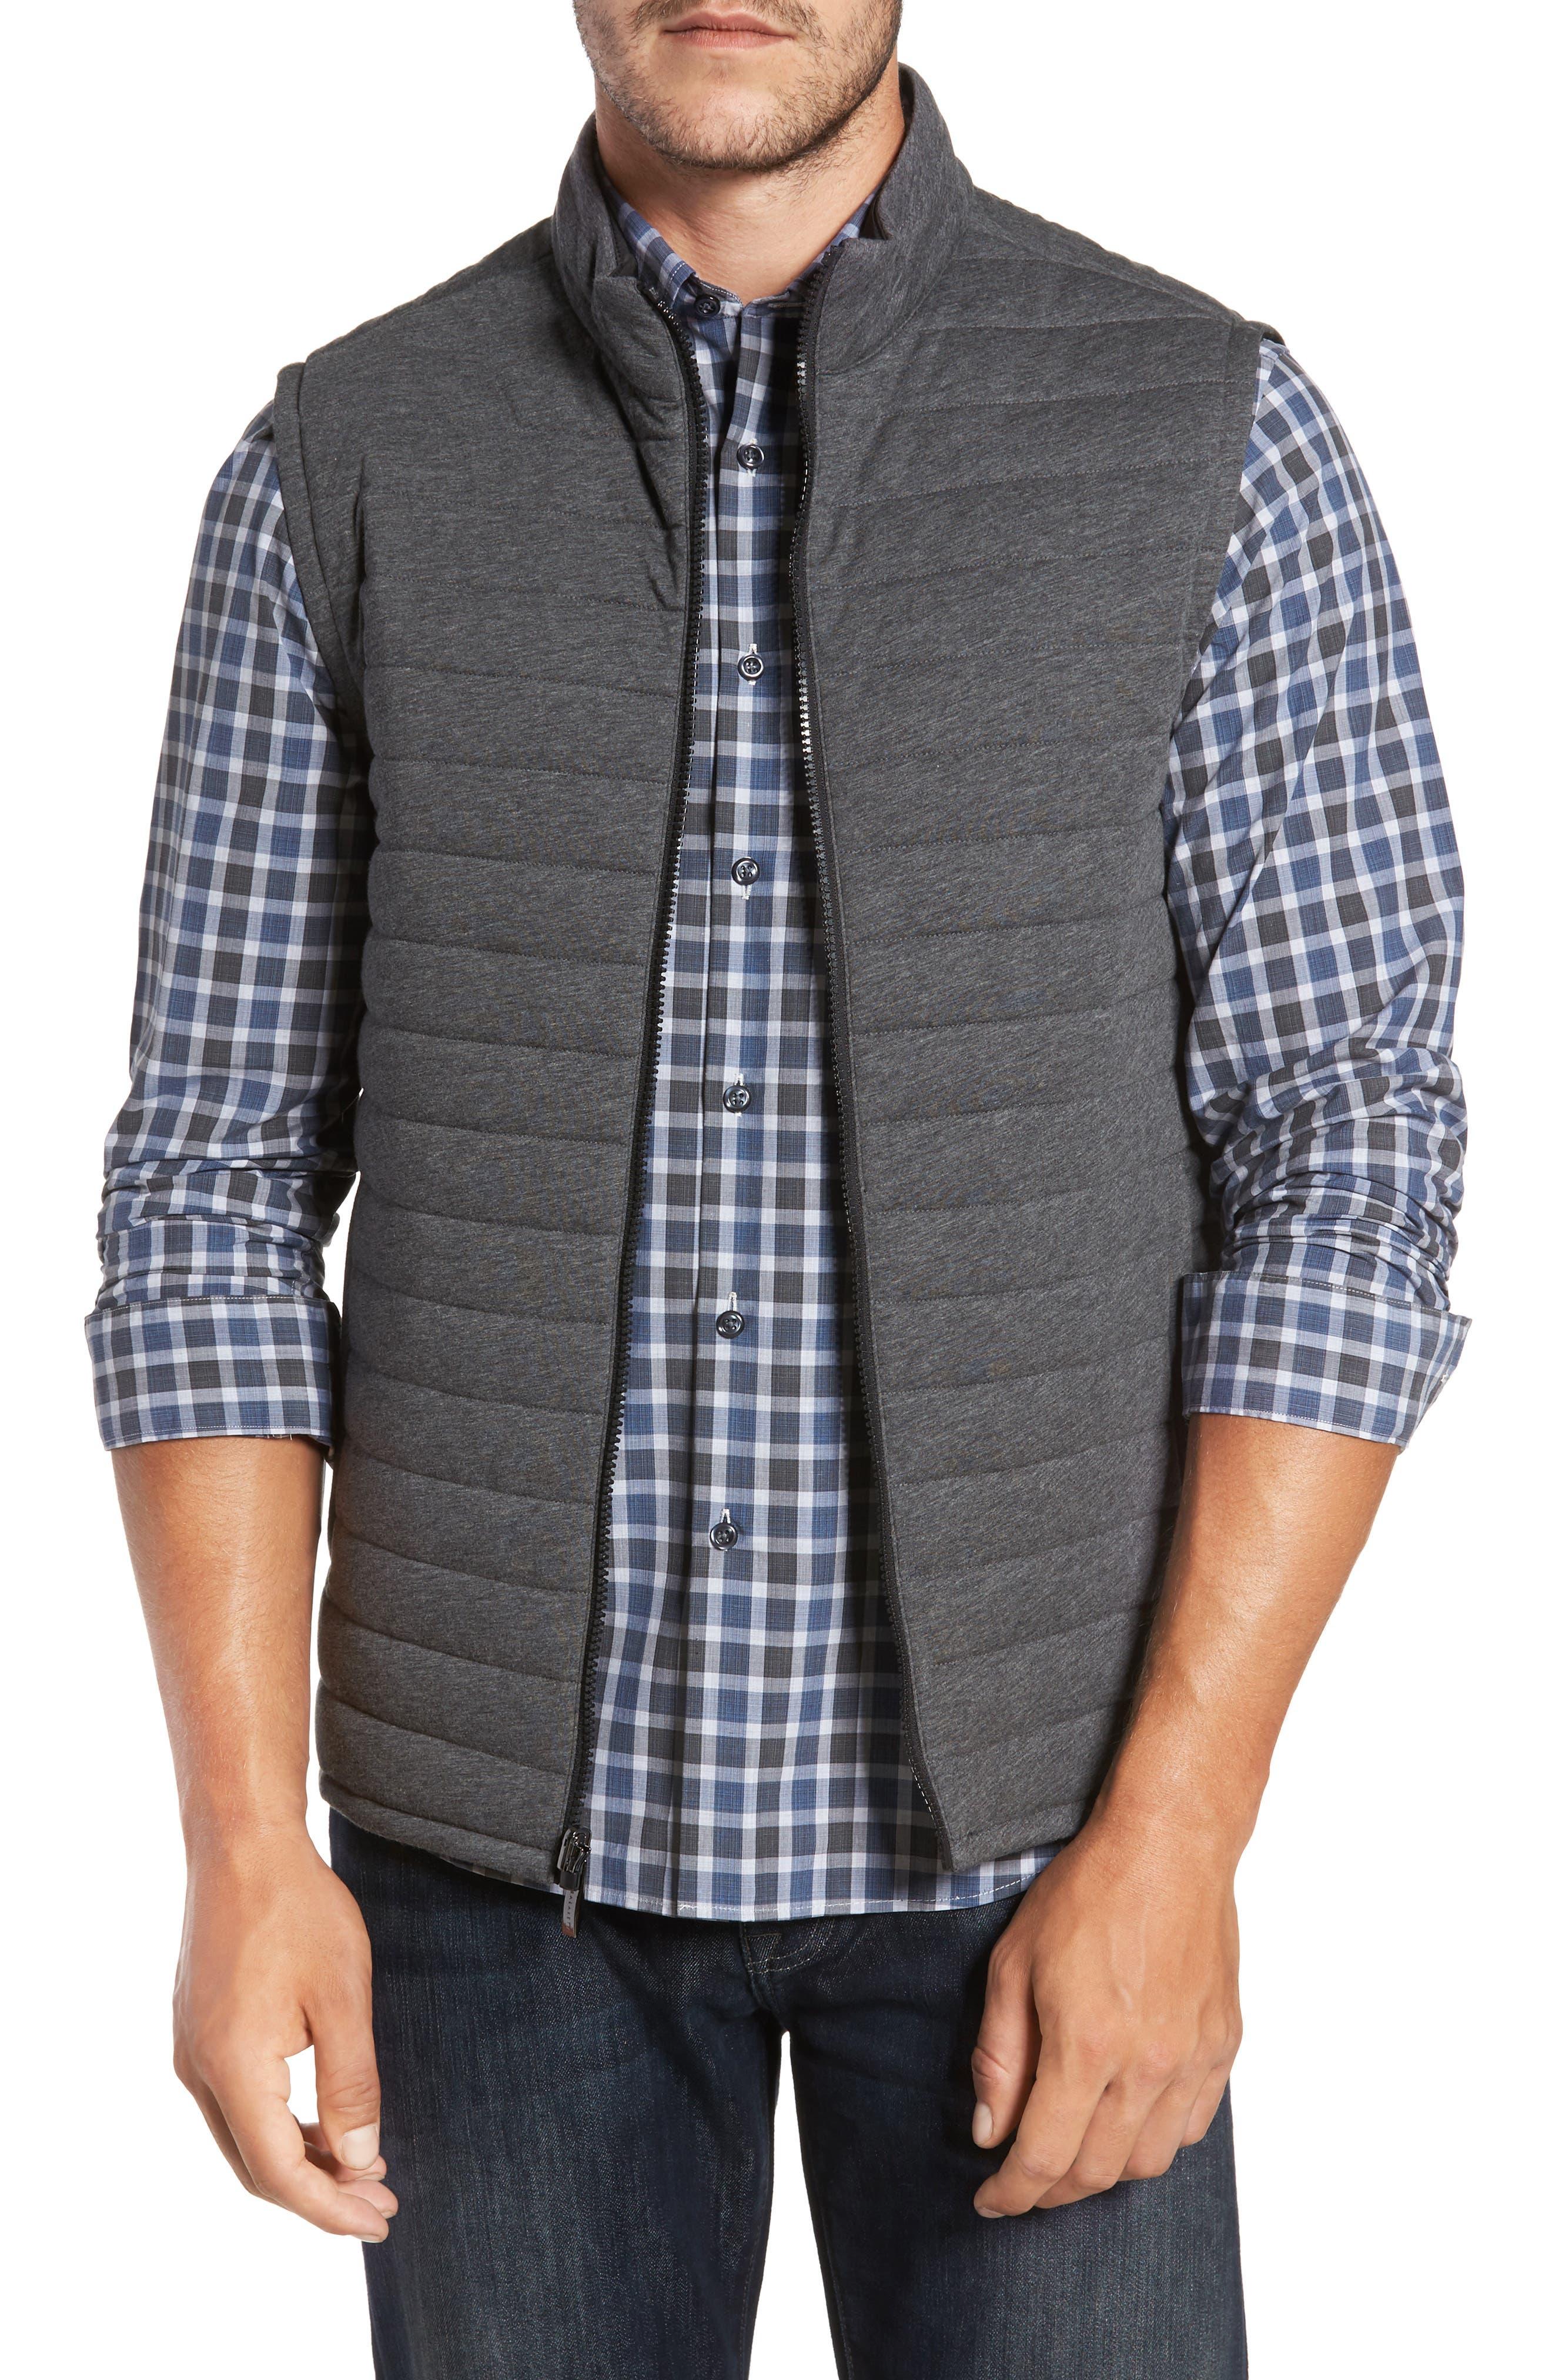 Gallagher Reversible Vest,                         Main,                         color, Charcoal